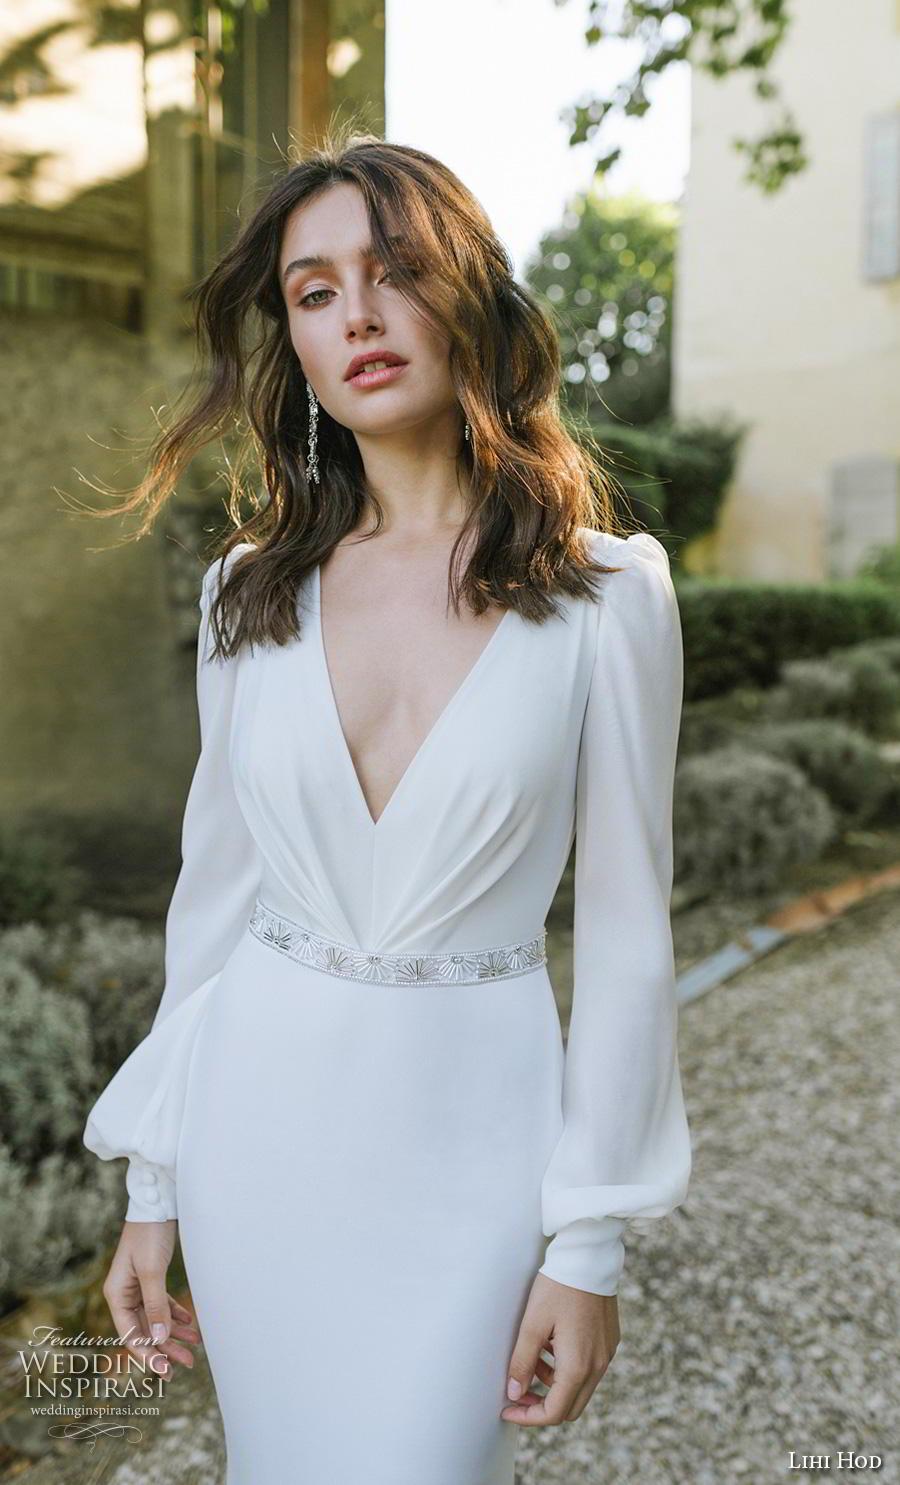 lihi hod 2019 bridal long bishop sleeves v neck simple minimalist elegant sheath fit and flare wedding dress (12) mv zv